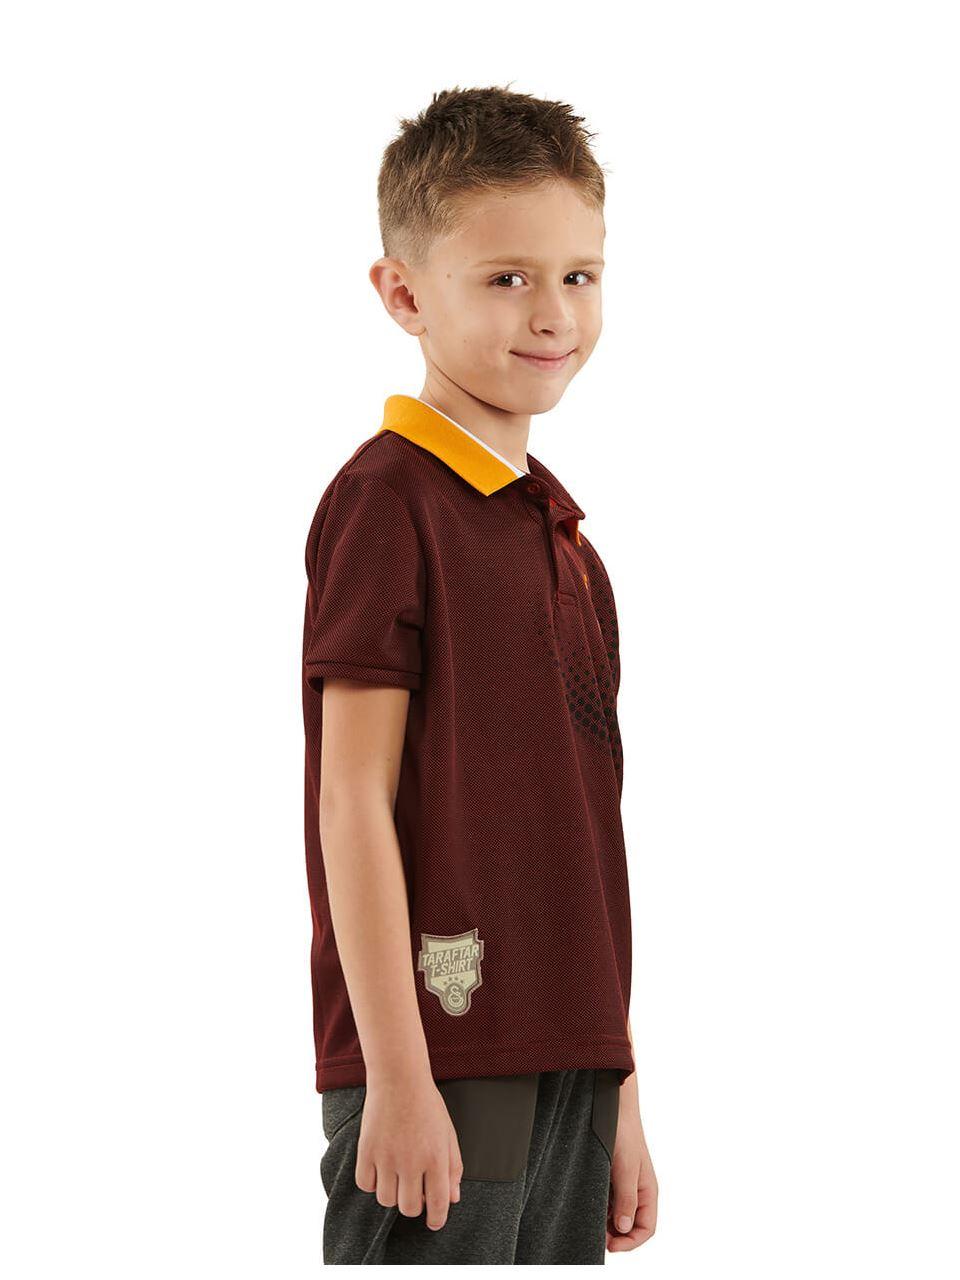 Galatasaray Gücün Simgesi Taraftar Çocuk T-shirt C191212